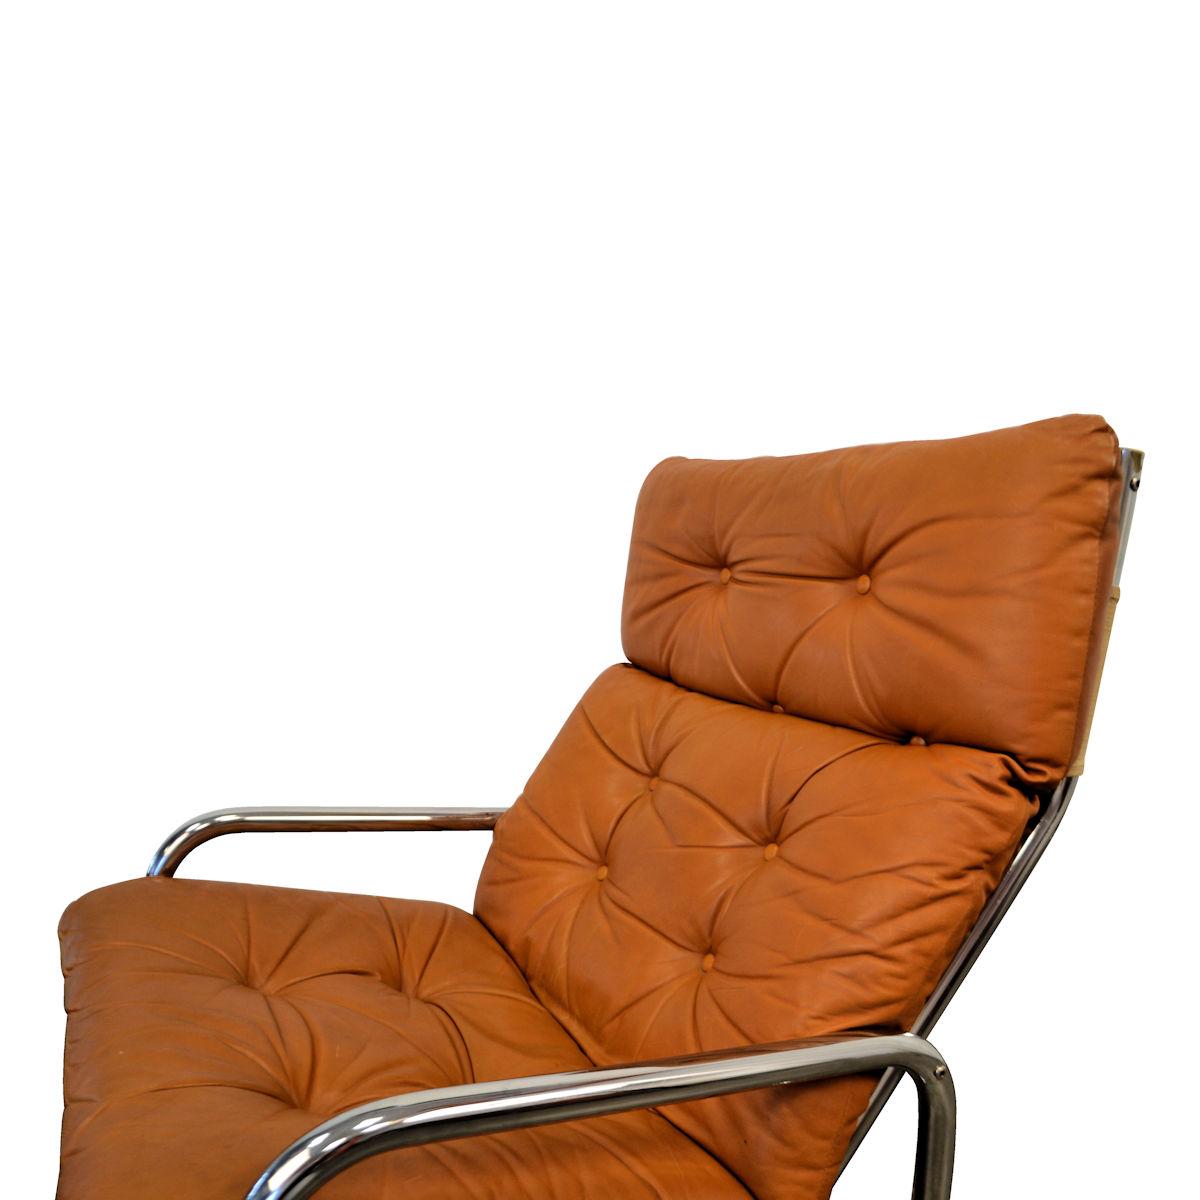 Fauteuil Design Leer.Vintage Leather Lounge Chair Vintage Vibes